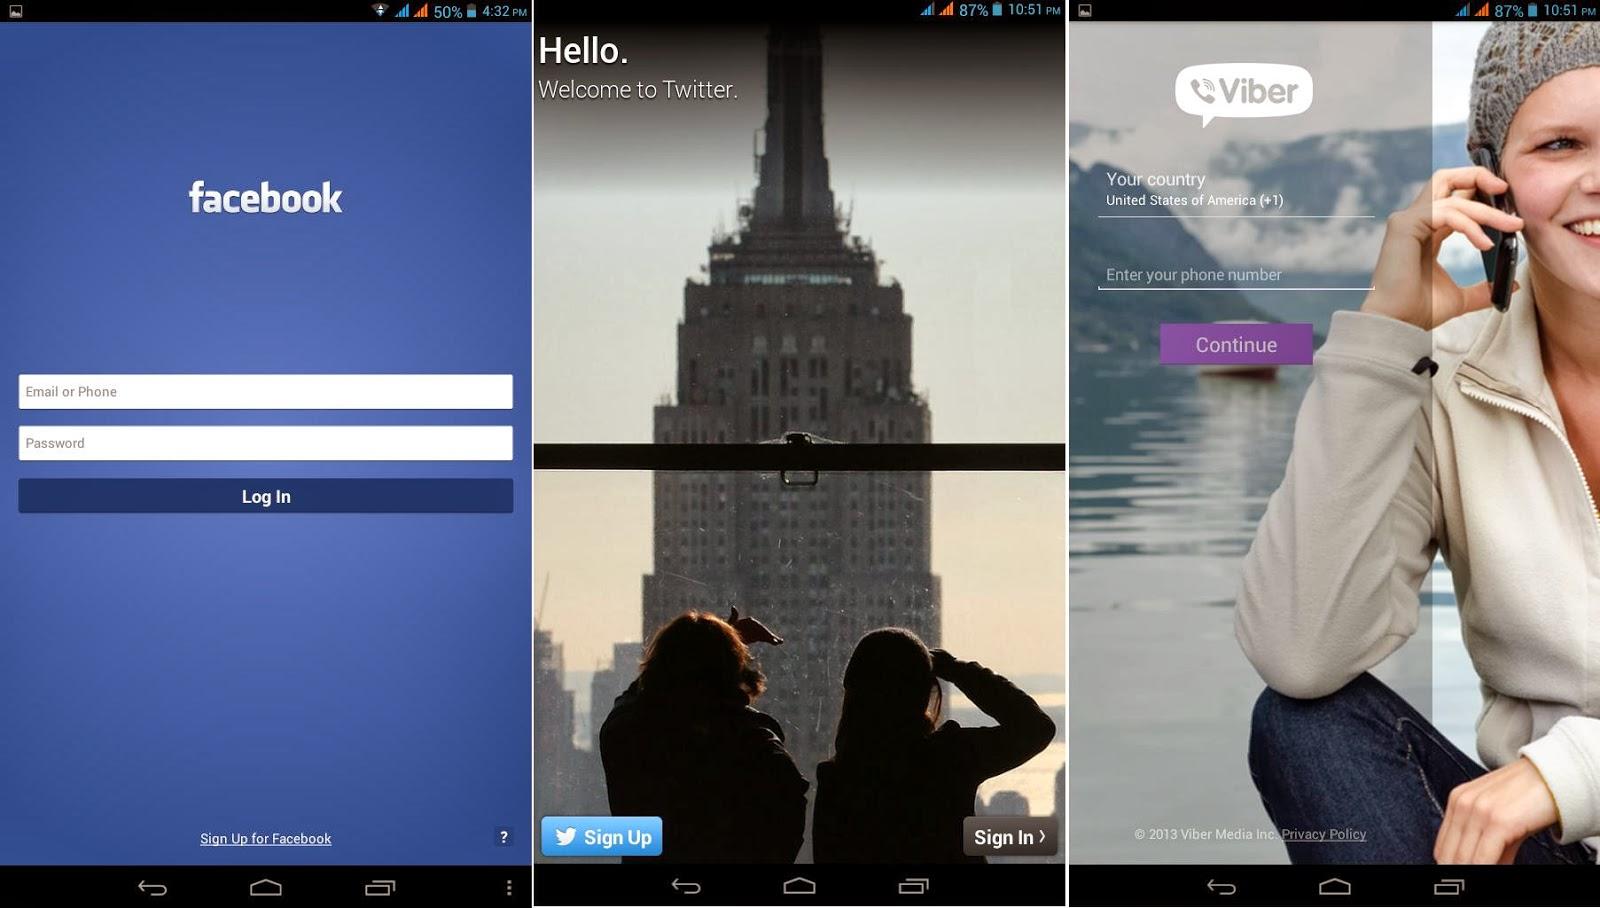 Facebook, Twitter & Viber